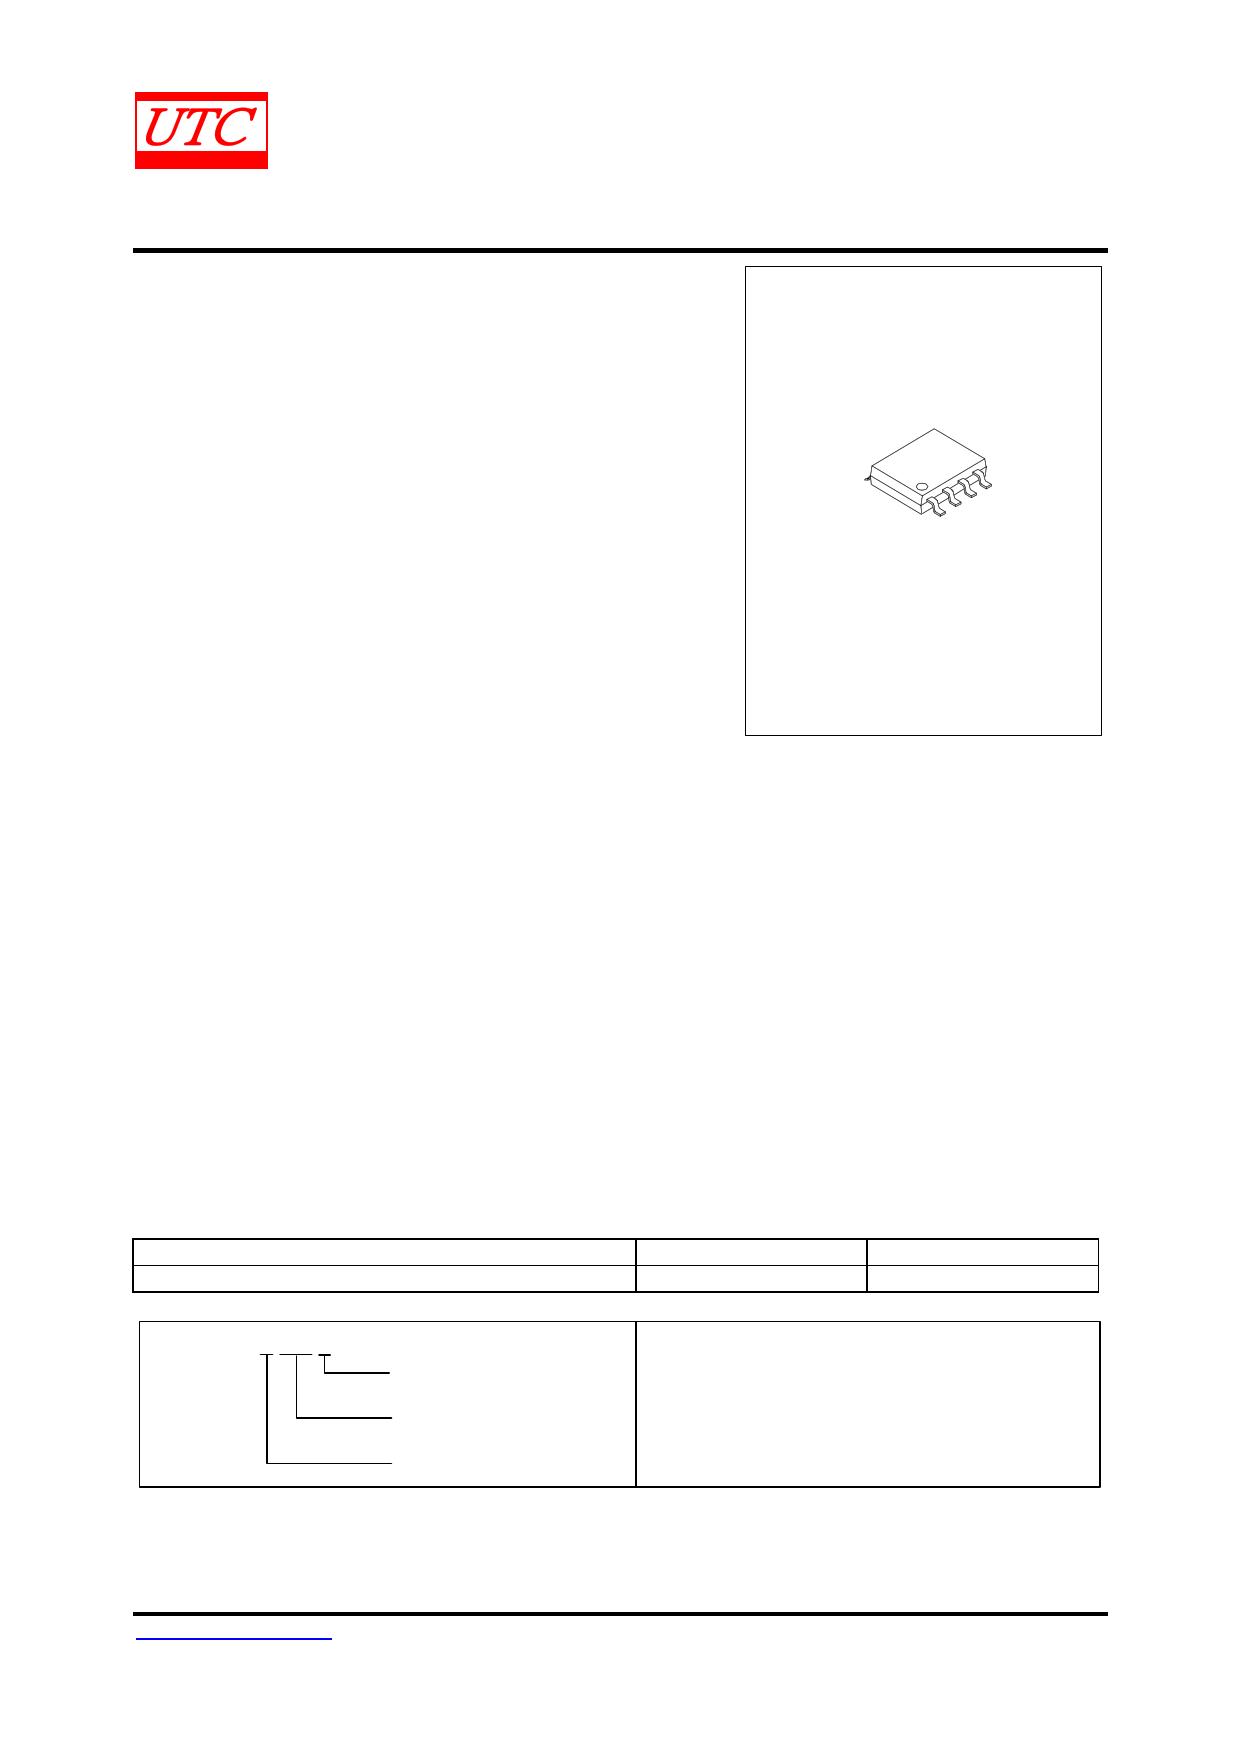 US4651S datasheet